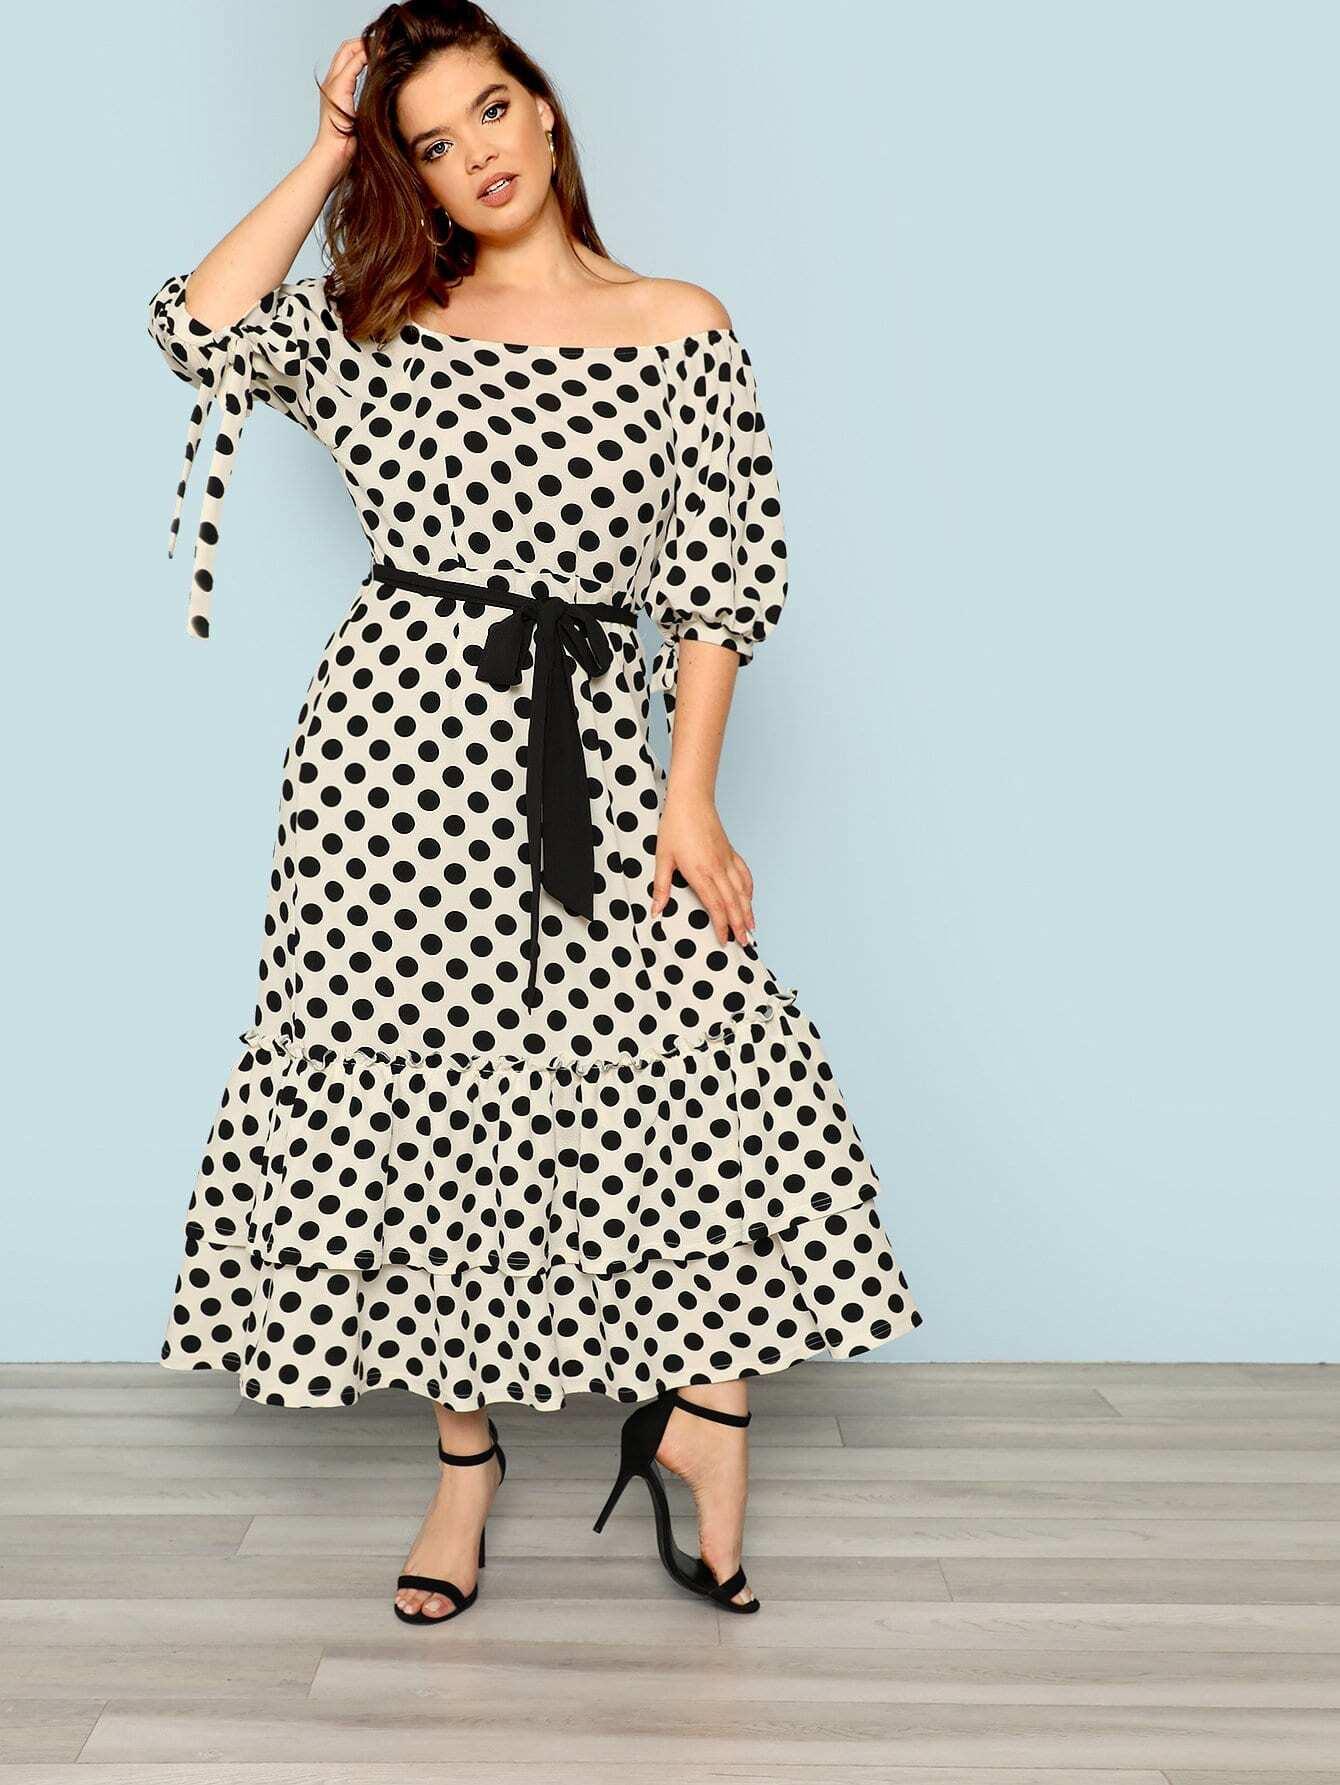 Plus Puff Sleeve Layered Ruffle Polka Dot Dress layered ruffle polka dot cami dress